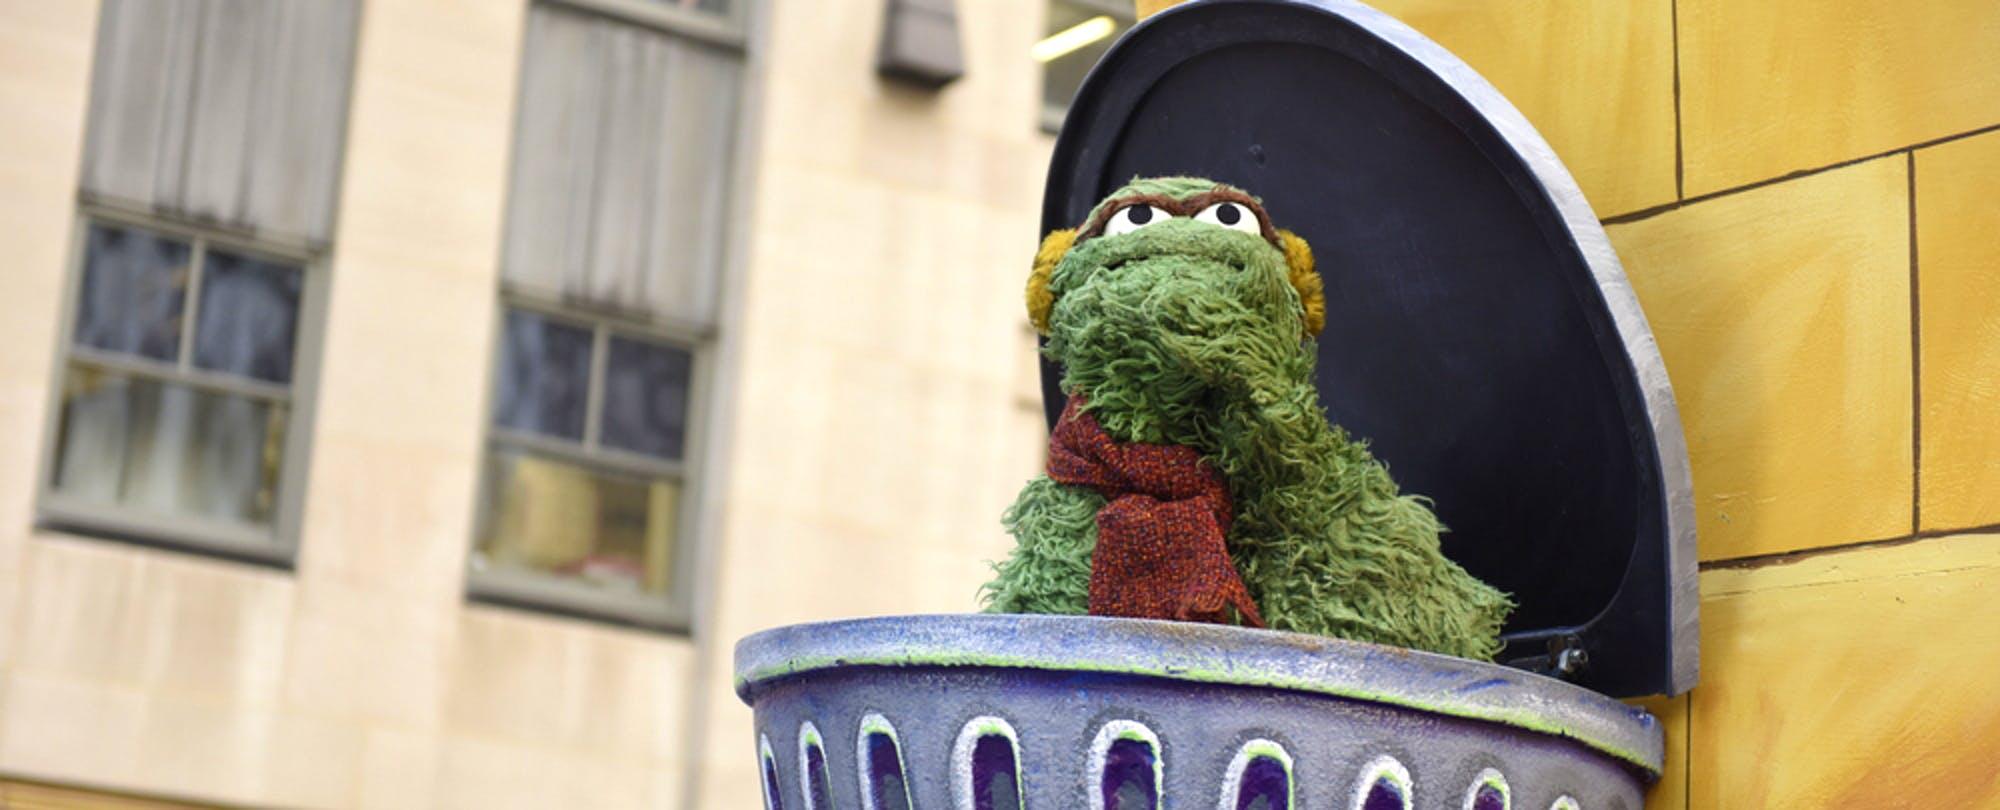 V Is for VC: Sesame Street Creator Launches $10 Million Venture Fund for Child Development